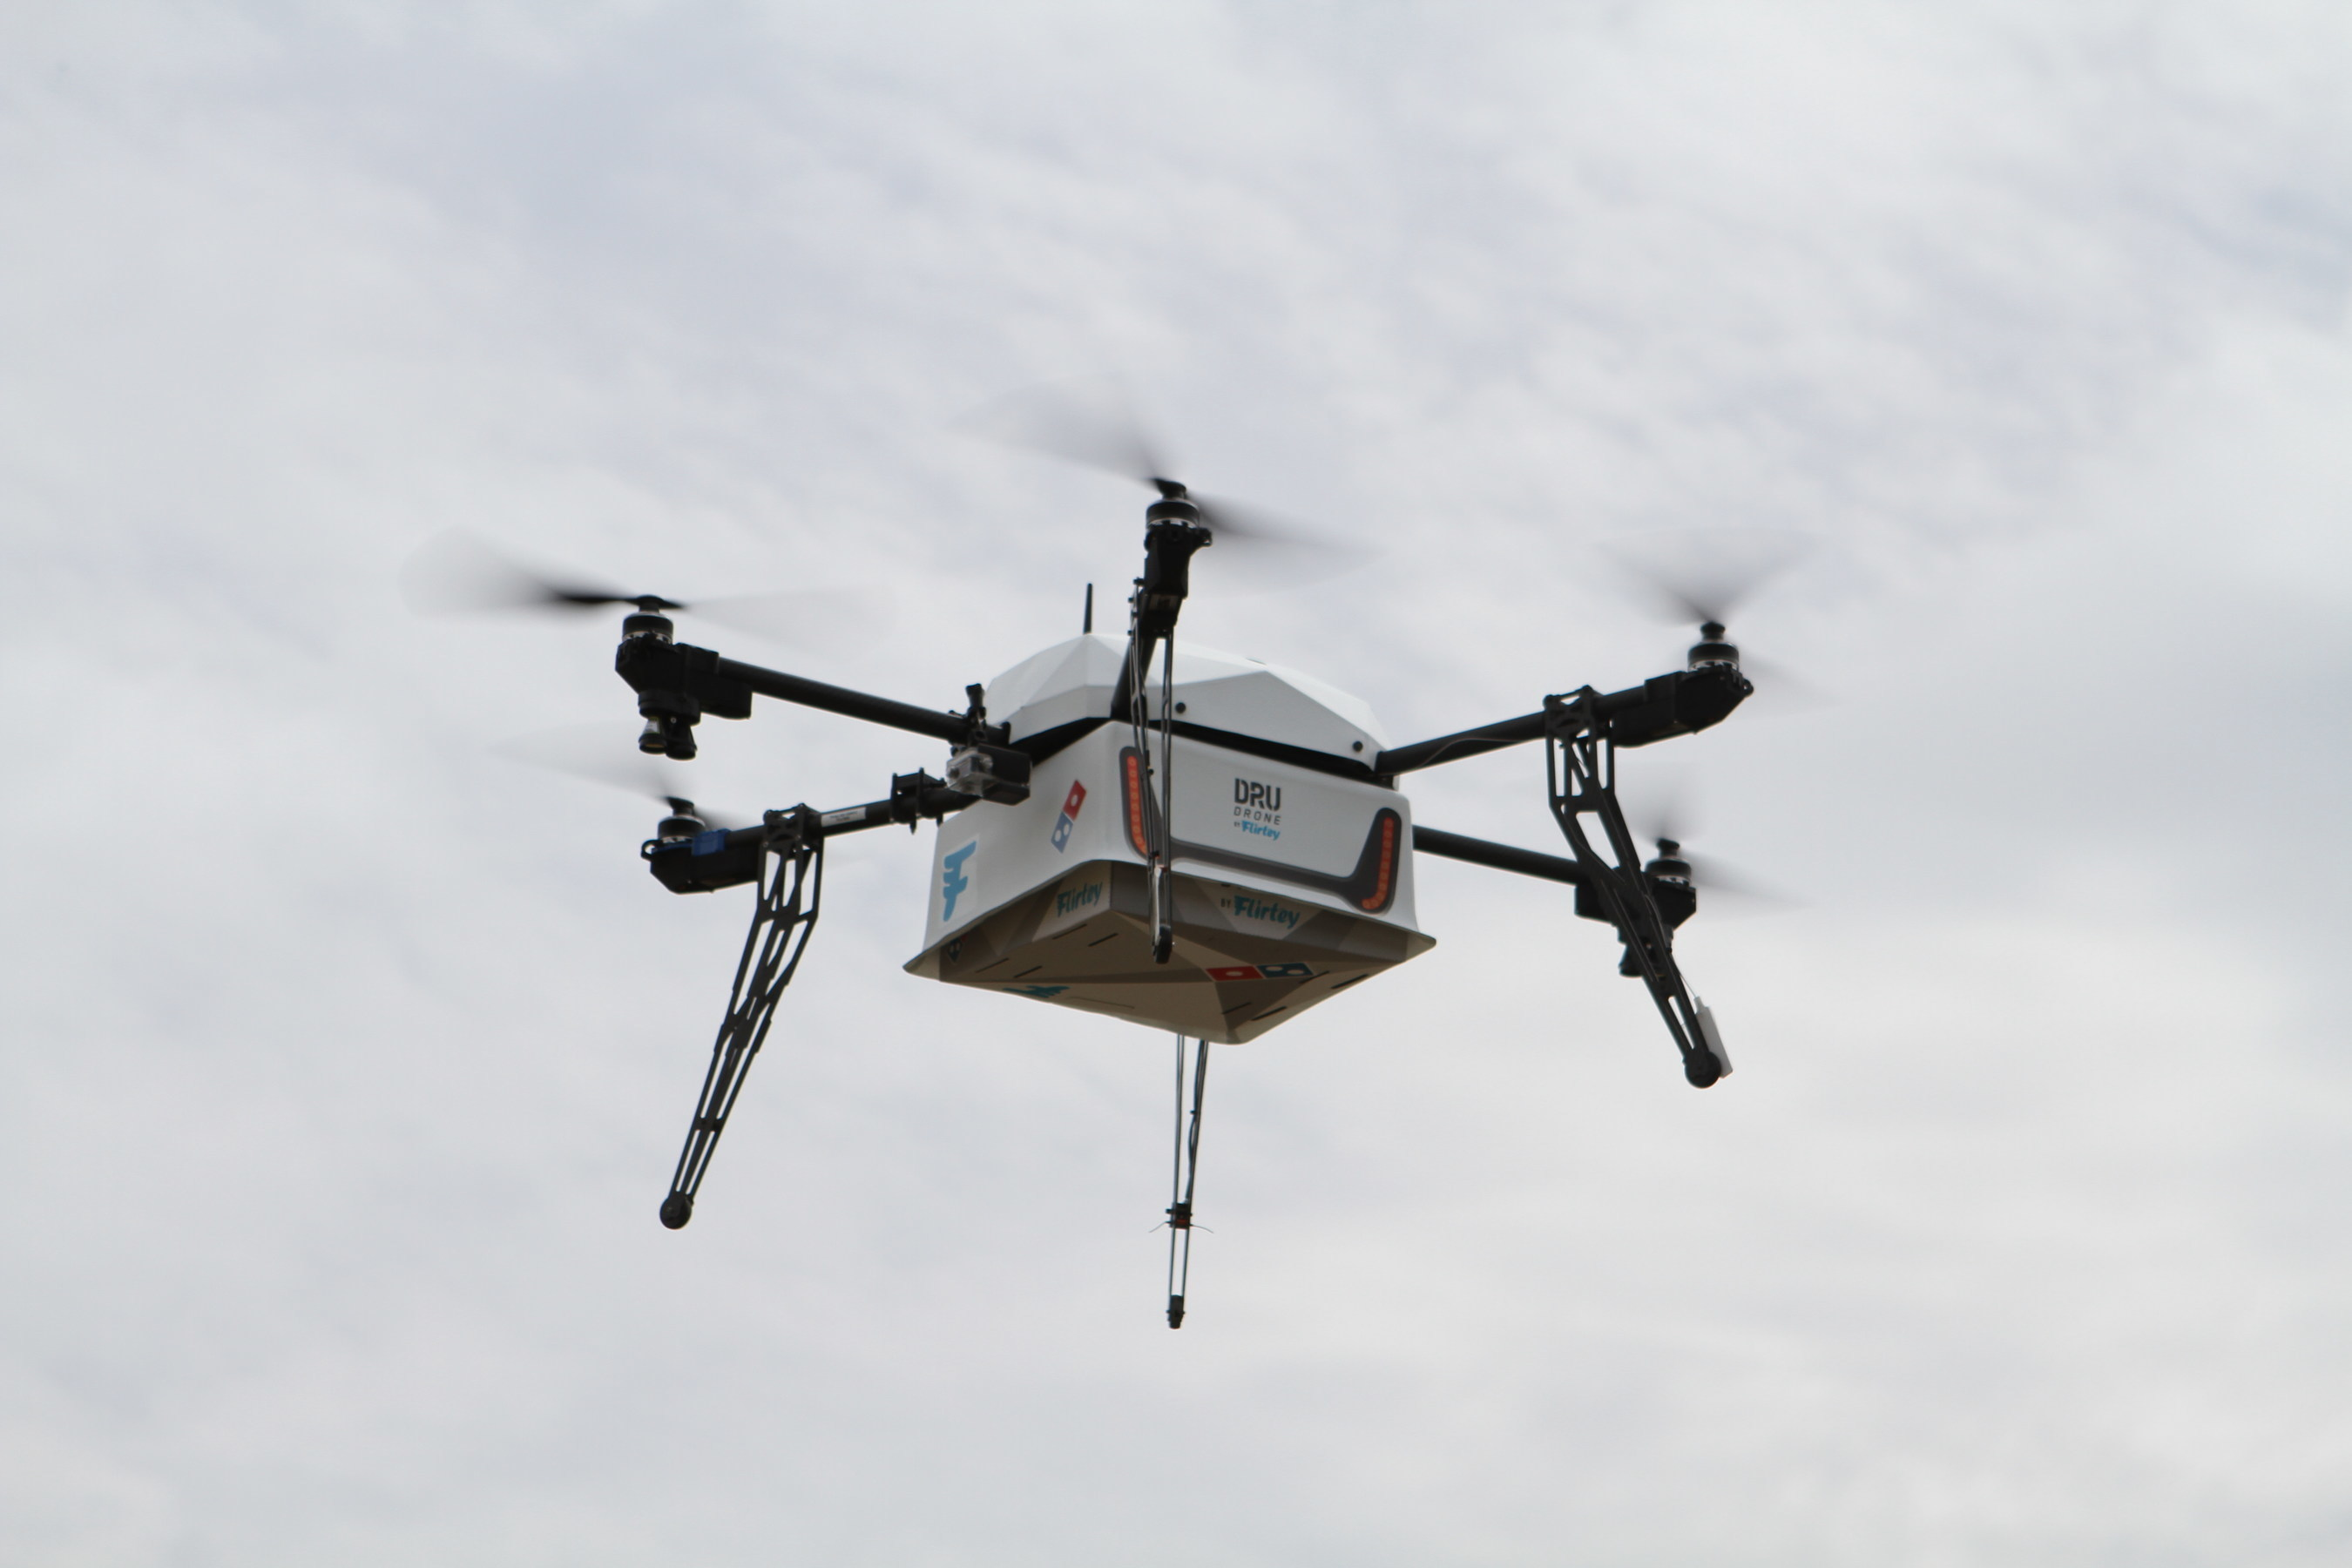 DRU Drone by Flirtey airborne